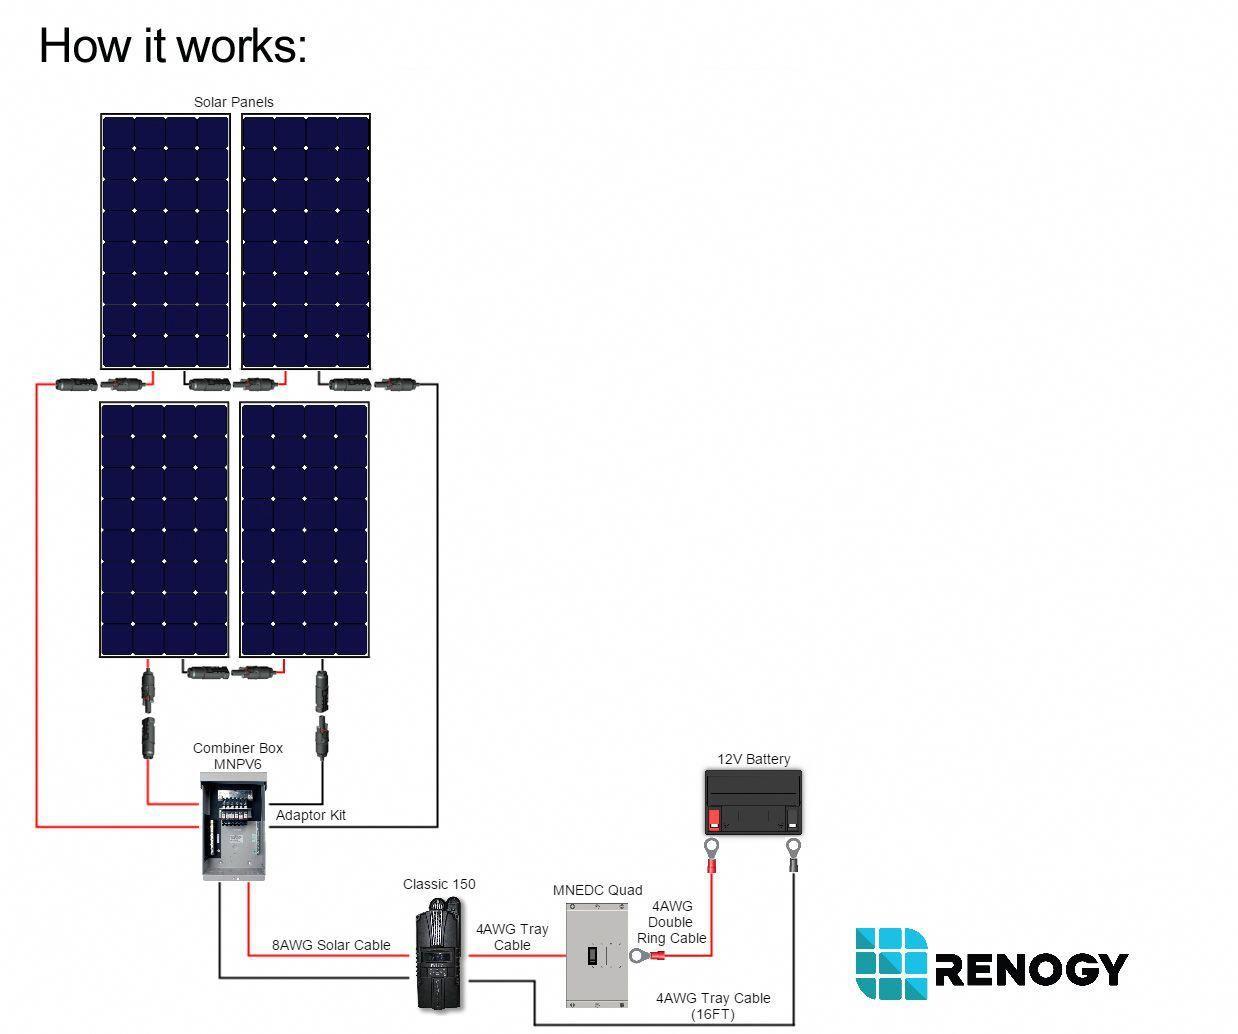 Renogy 1200w Solar Kit Wiring Solarpanels Solarenergy Solarpower Solargenerator Solarpanelkits Solarwaterhe In 2020 Best Solar Panels Solar Energy Panels Solar Panels